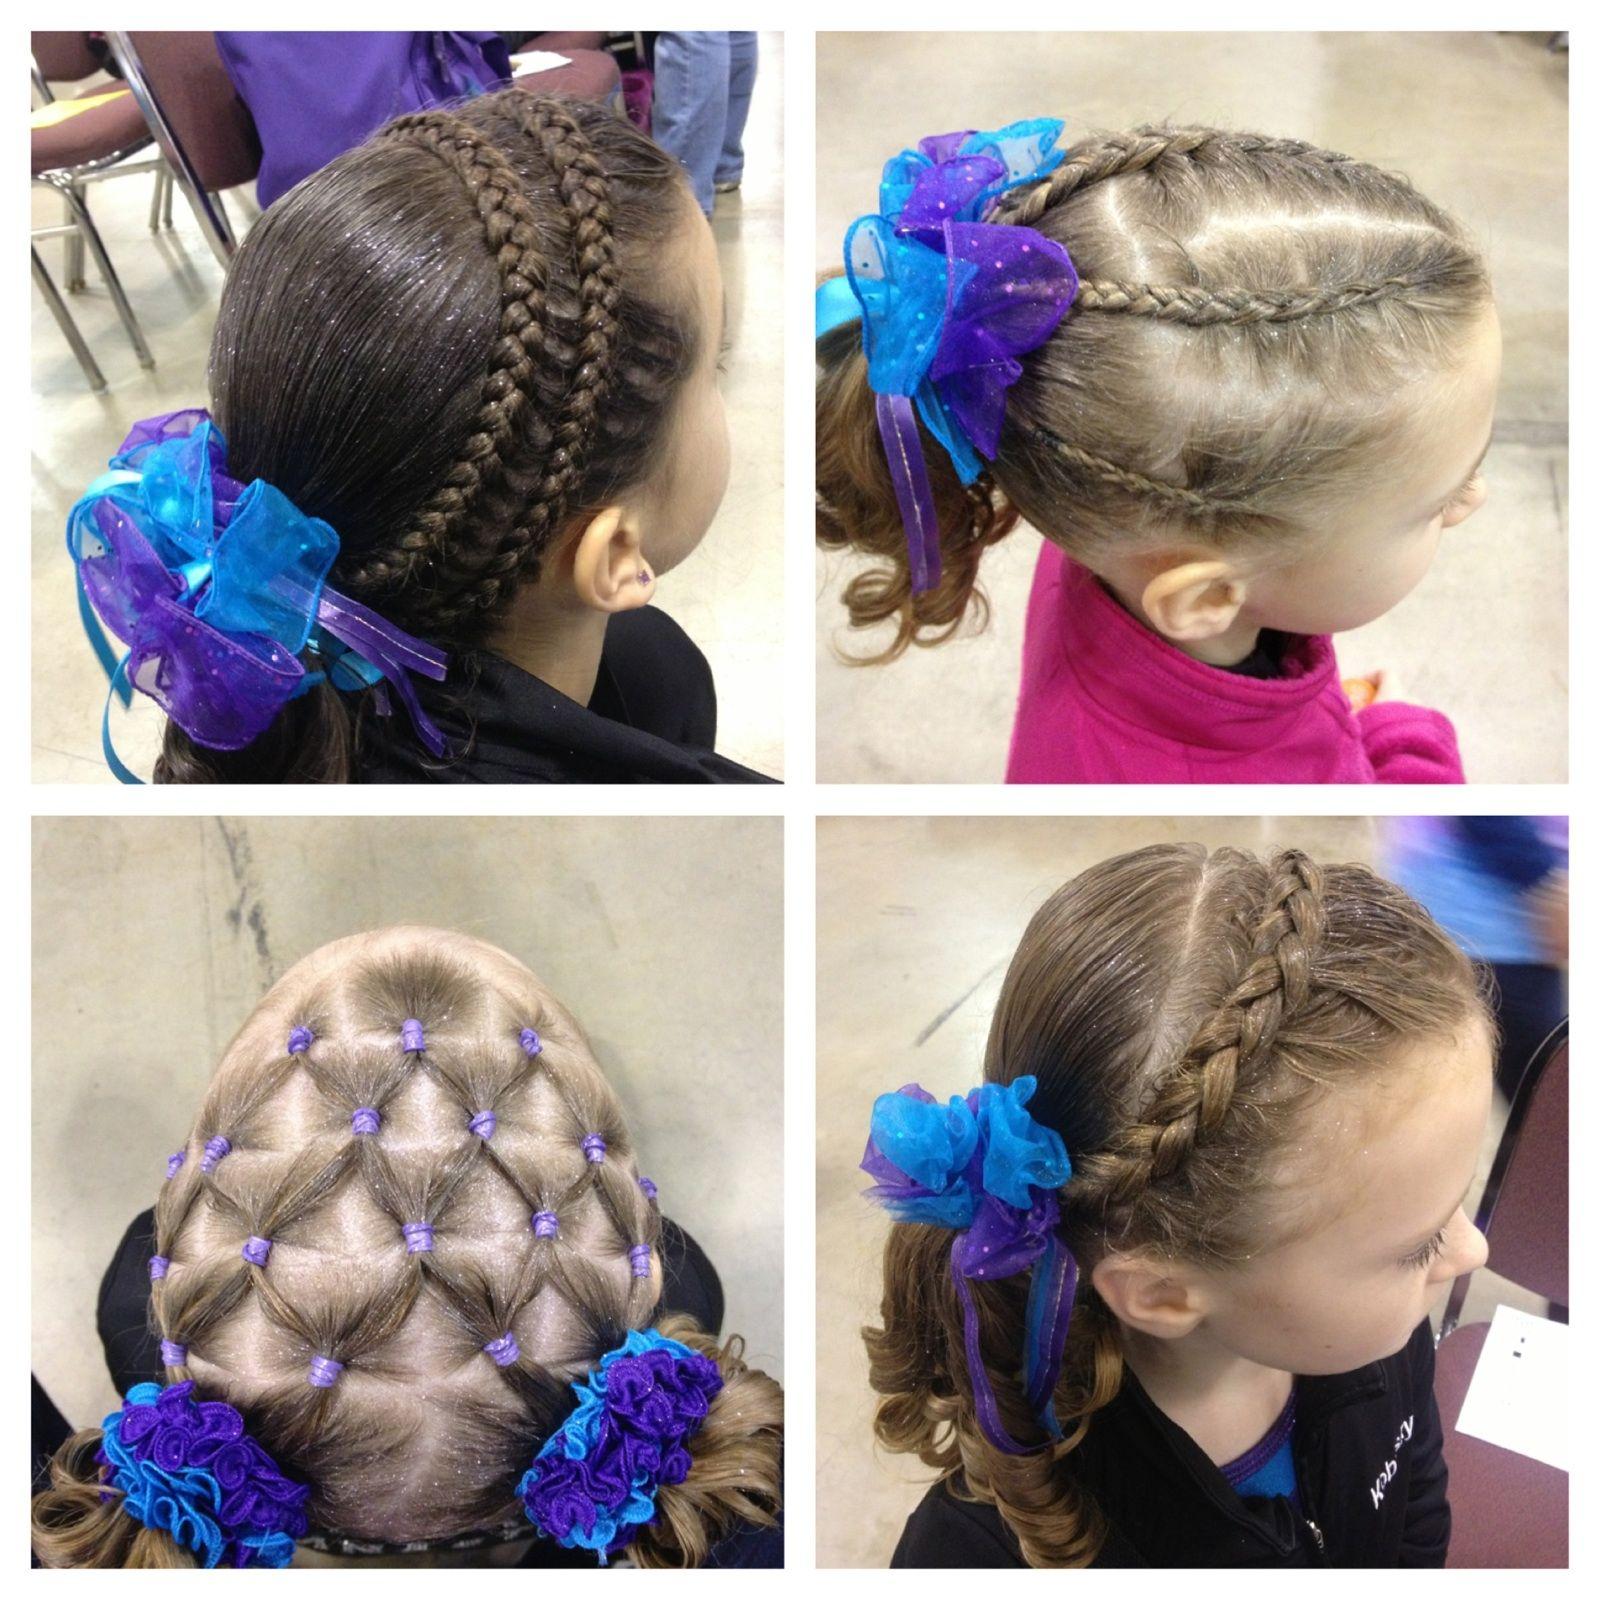 Pin By Dayna Noland Hilton On Once A Gymnast Always A Gymnast 3 Gymnastics Hair Hair Styles Competition Hair